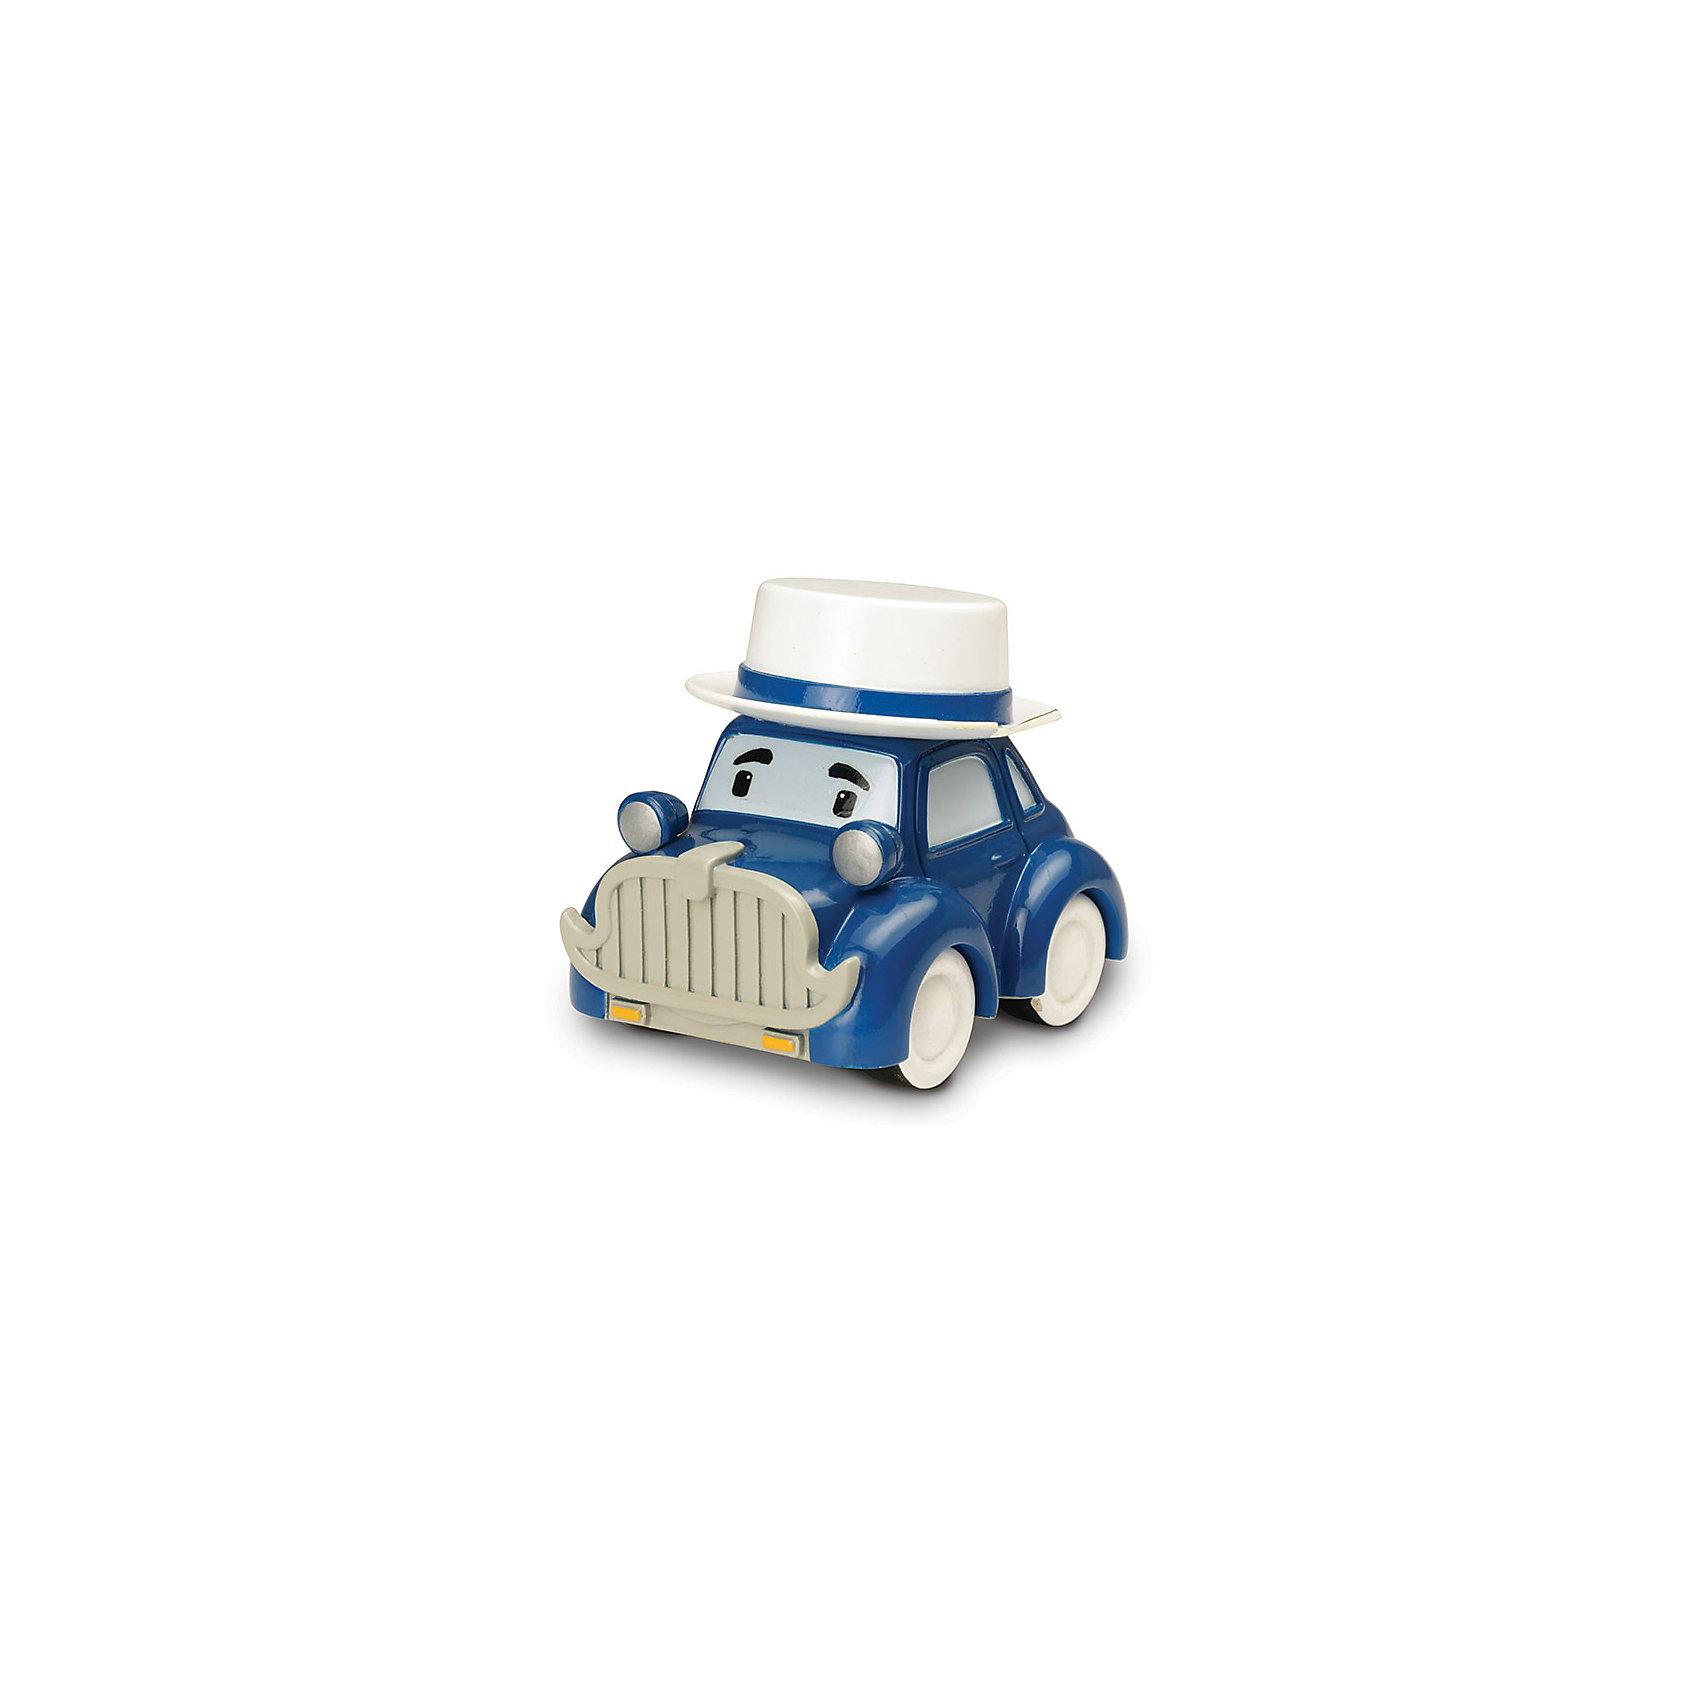 Silverlit Игрушка Металлическая машинка Масти, 6 см, Робокар Поли silverlit silverlit robocar poli пости металлическая машинка 6 см